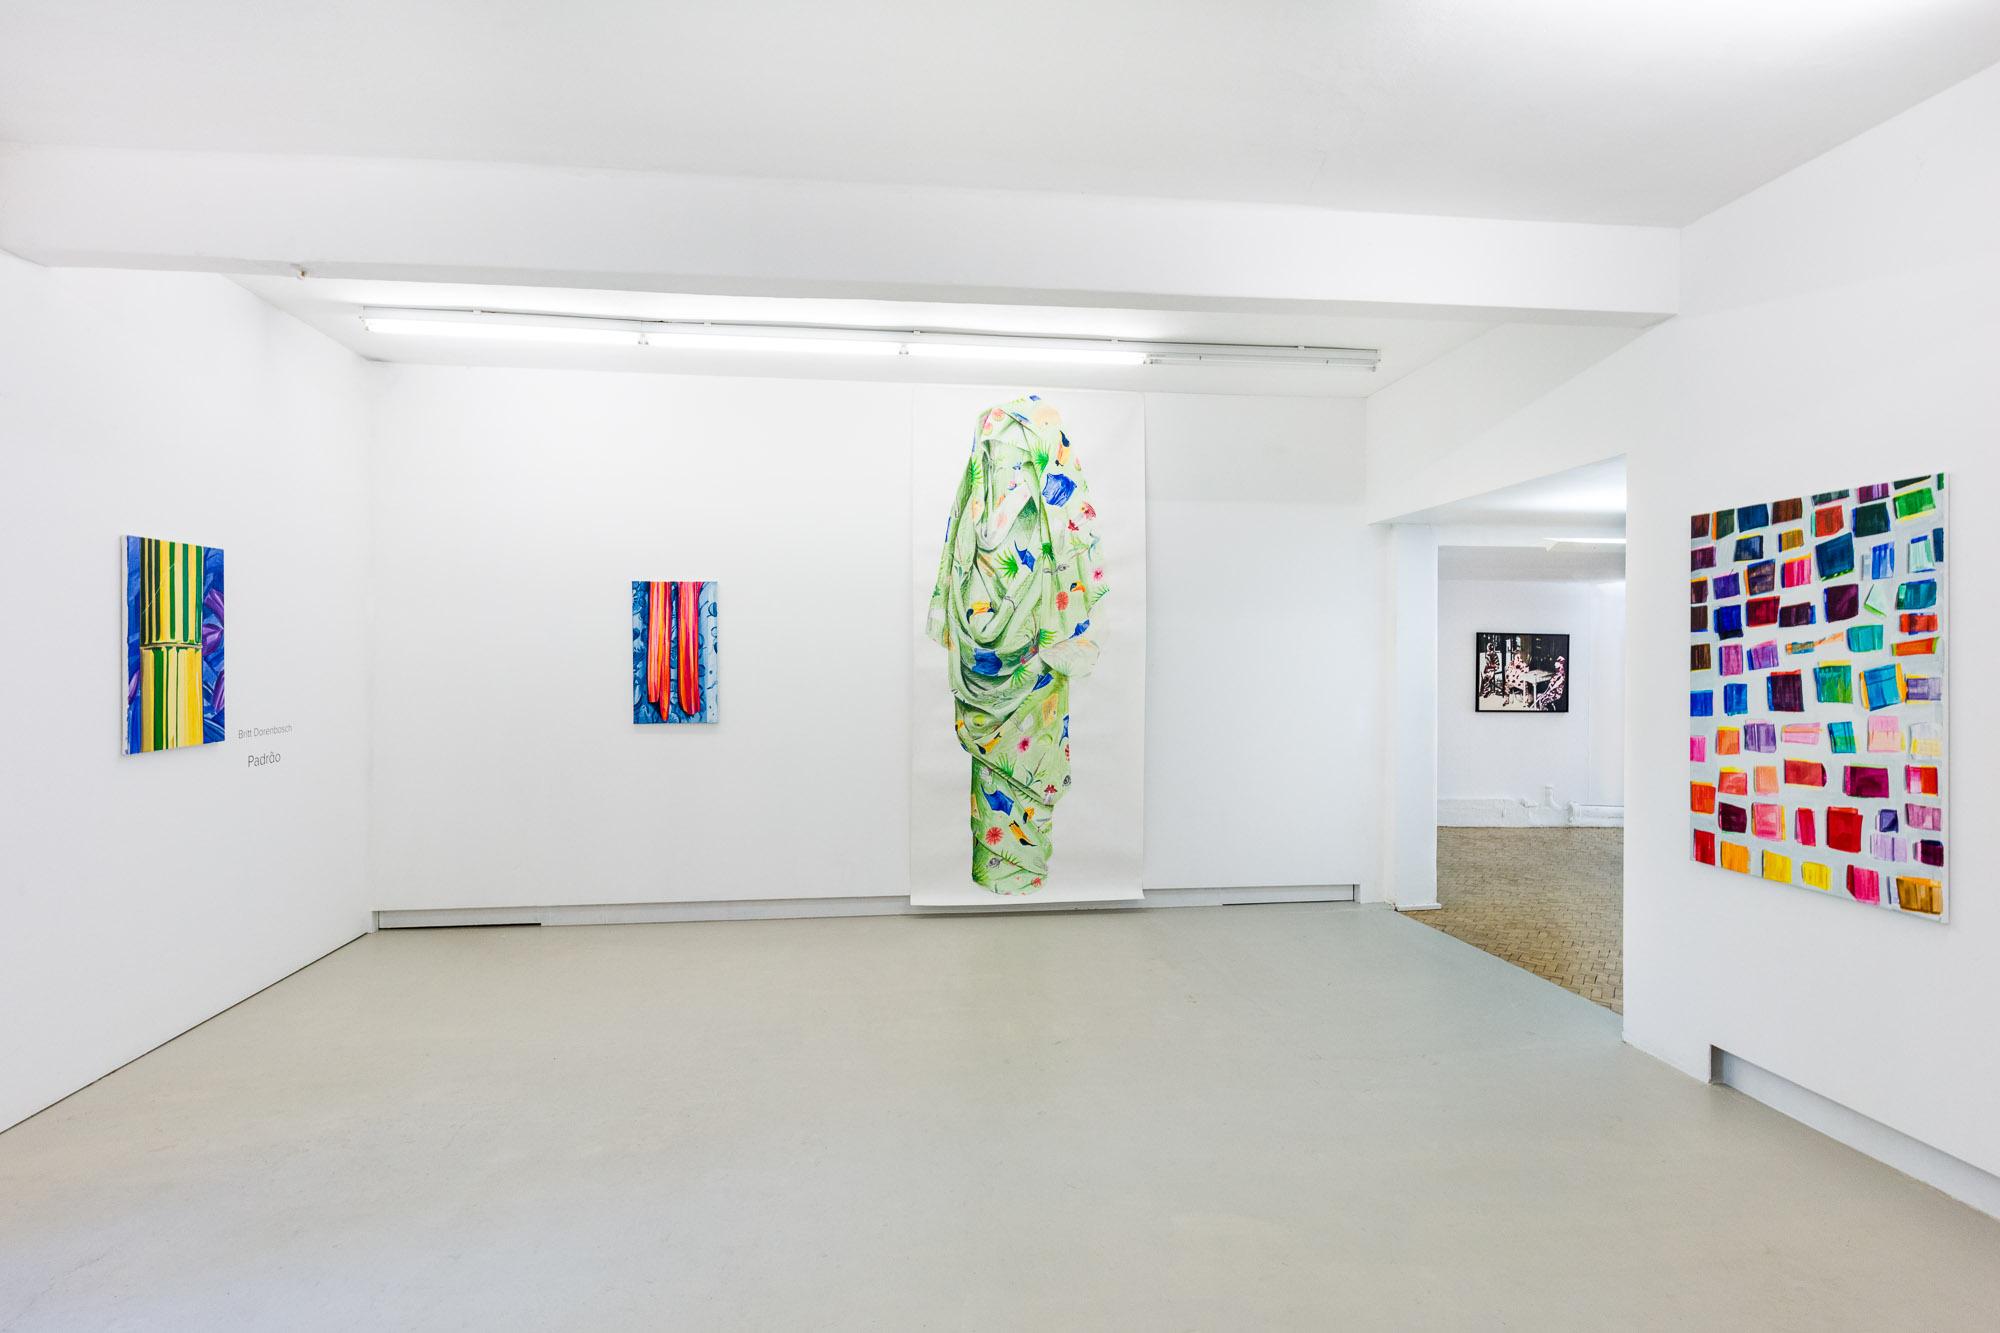 Britt-Dorenbosch Padrao at galerie dudokdegroot